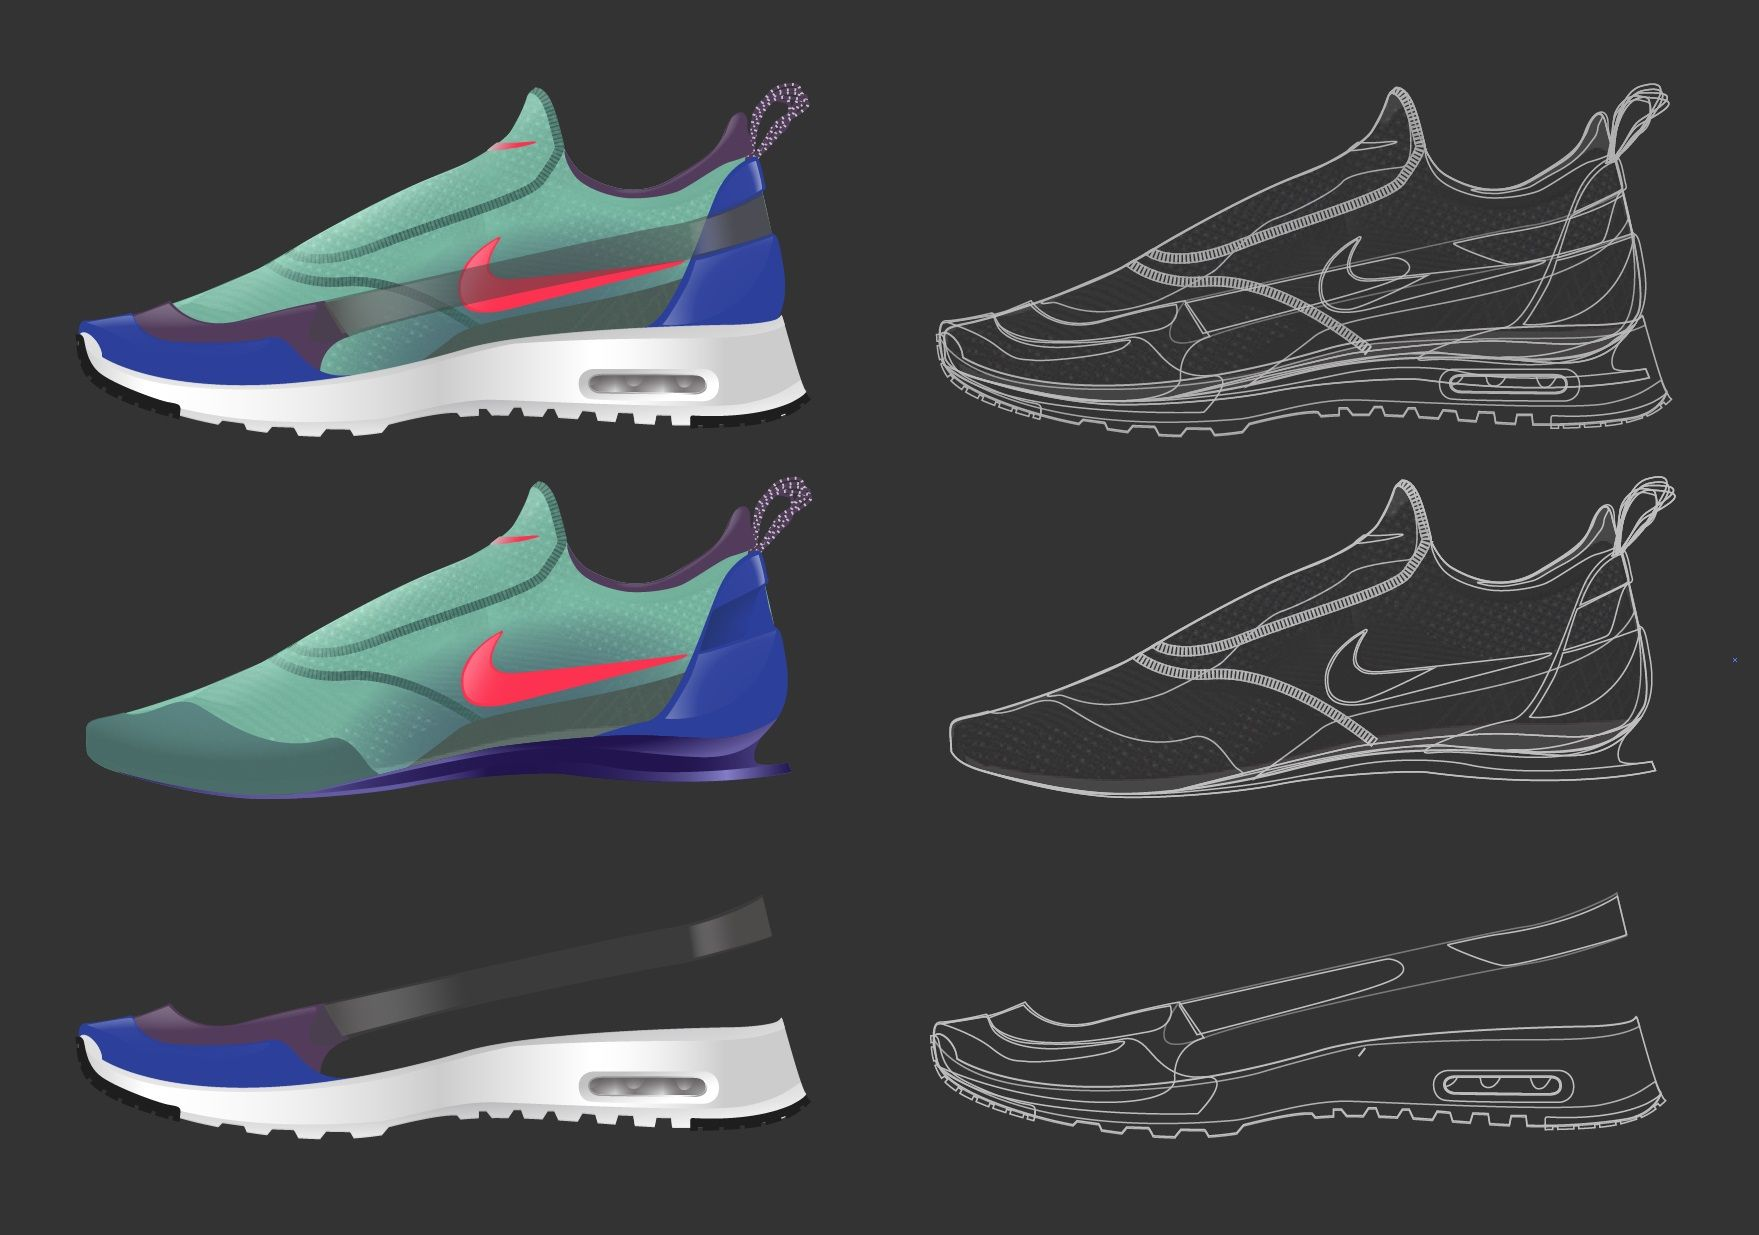 nike shoes concept air max elastic band